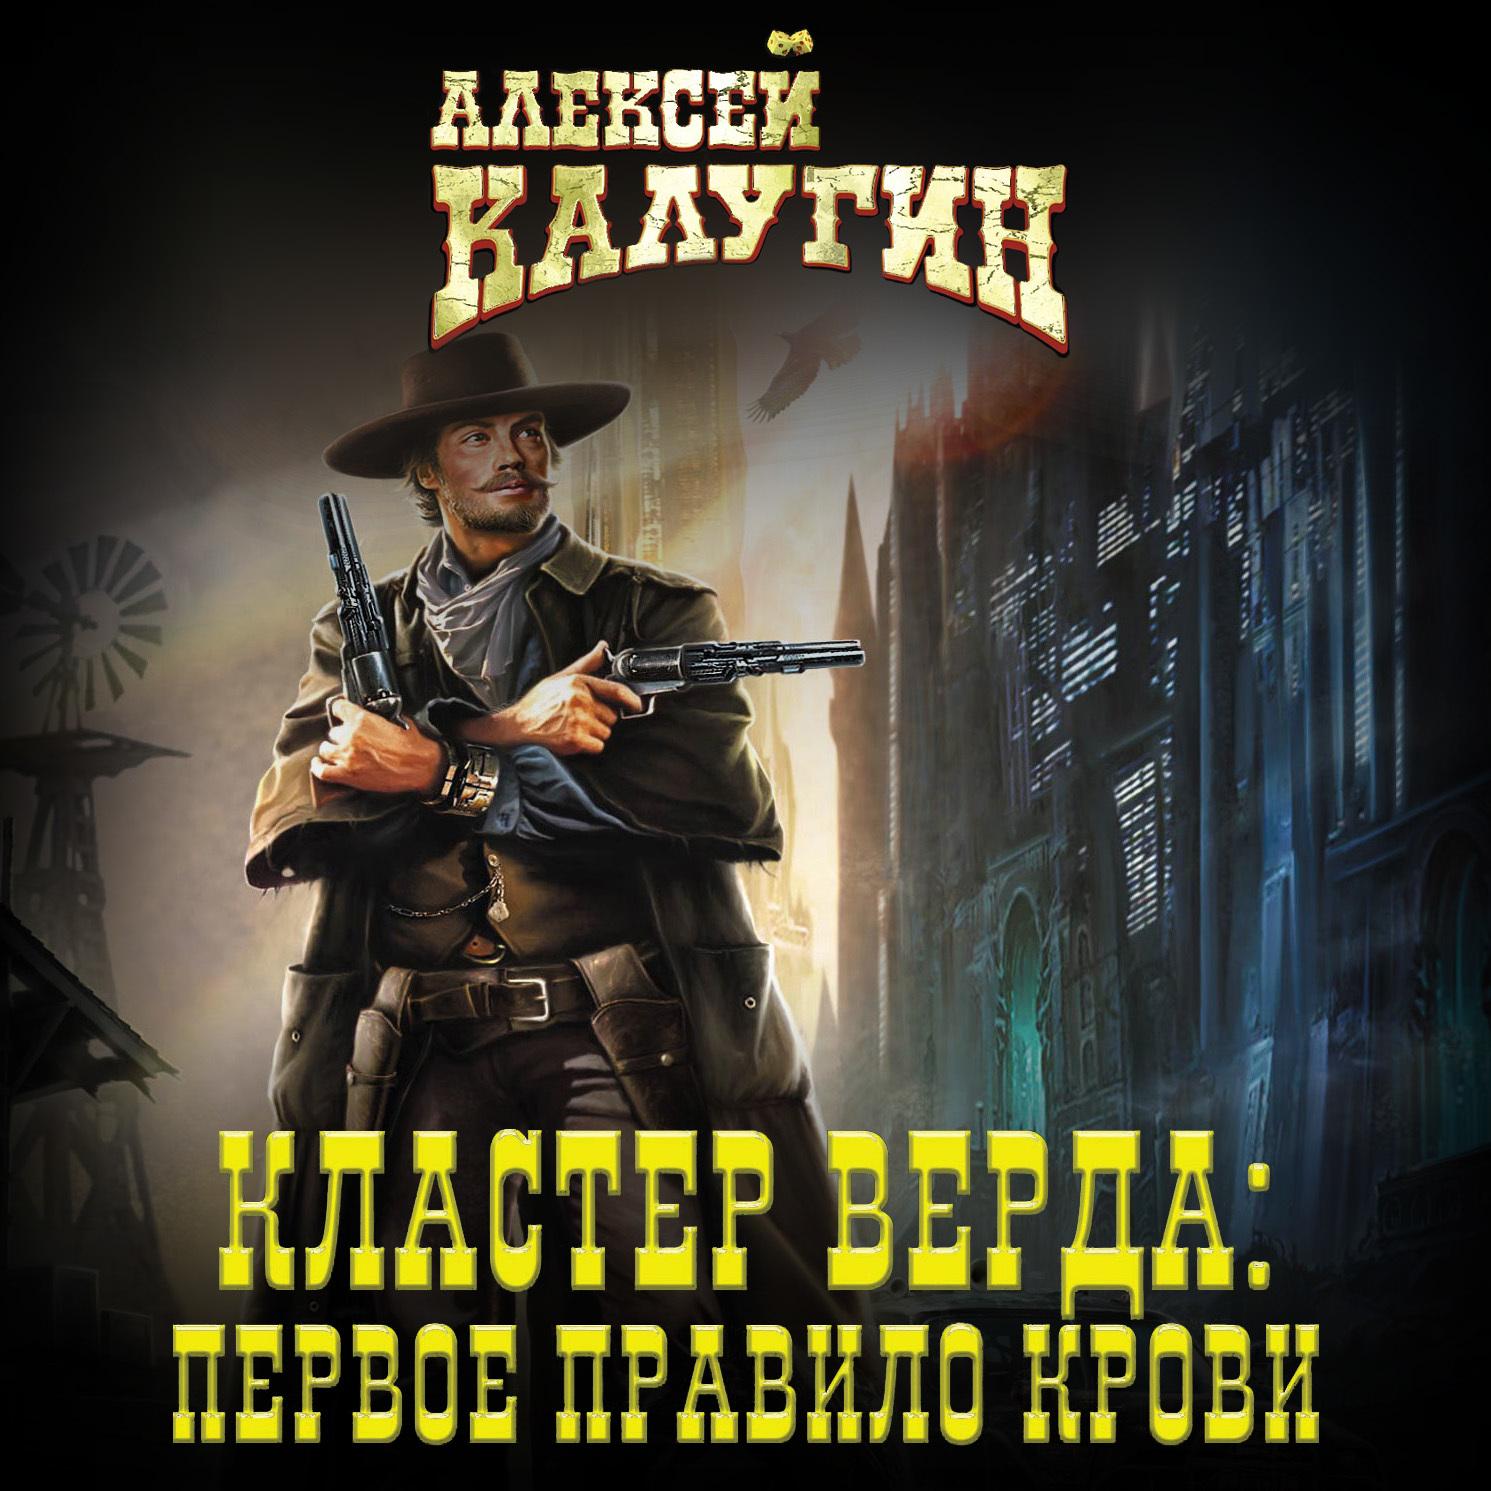 Алексей Калугин Кластер Верда: Первое правило крови алексей макеев коктейль на крови